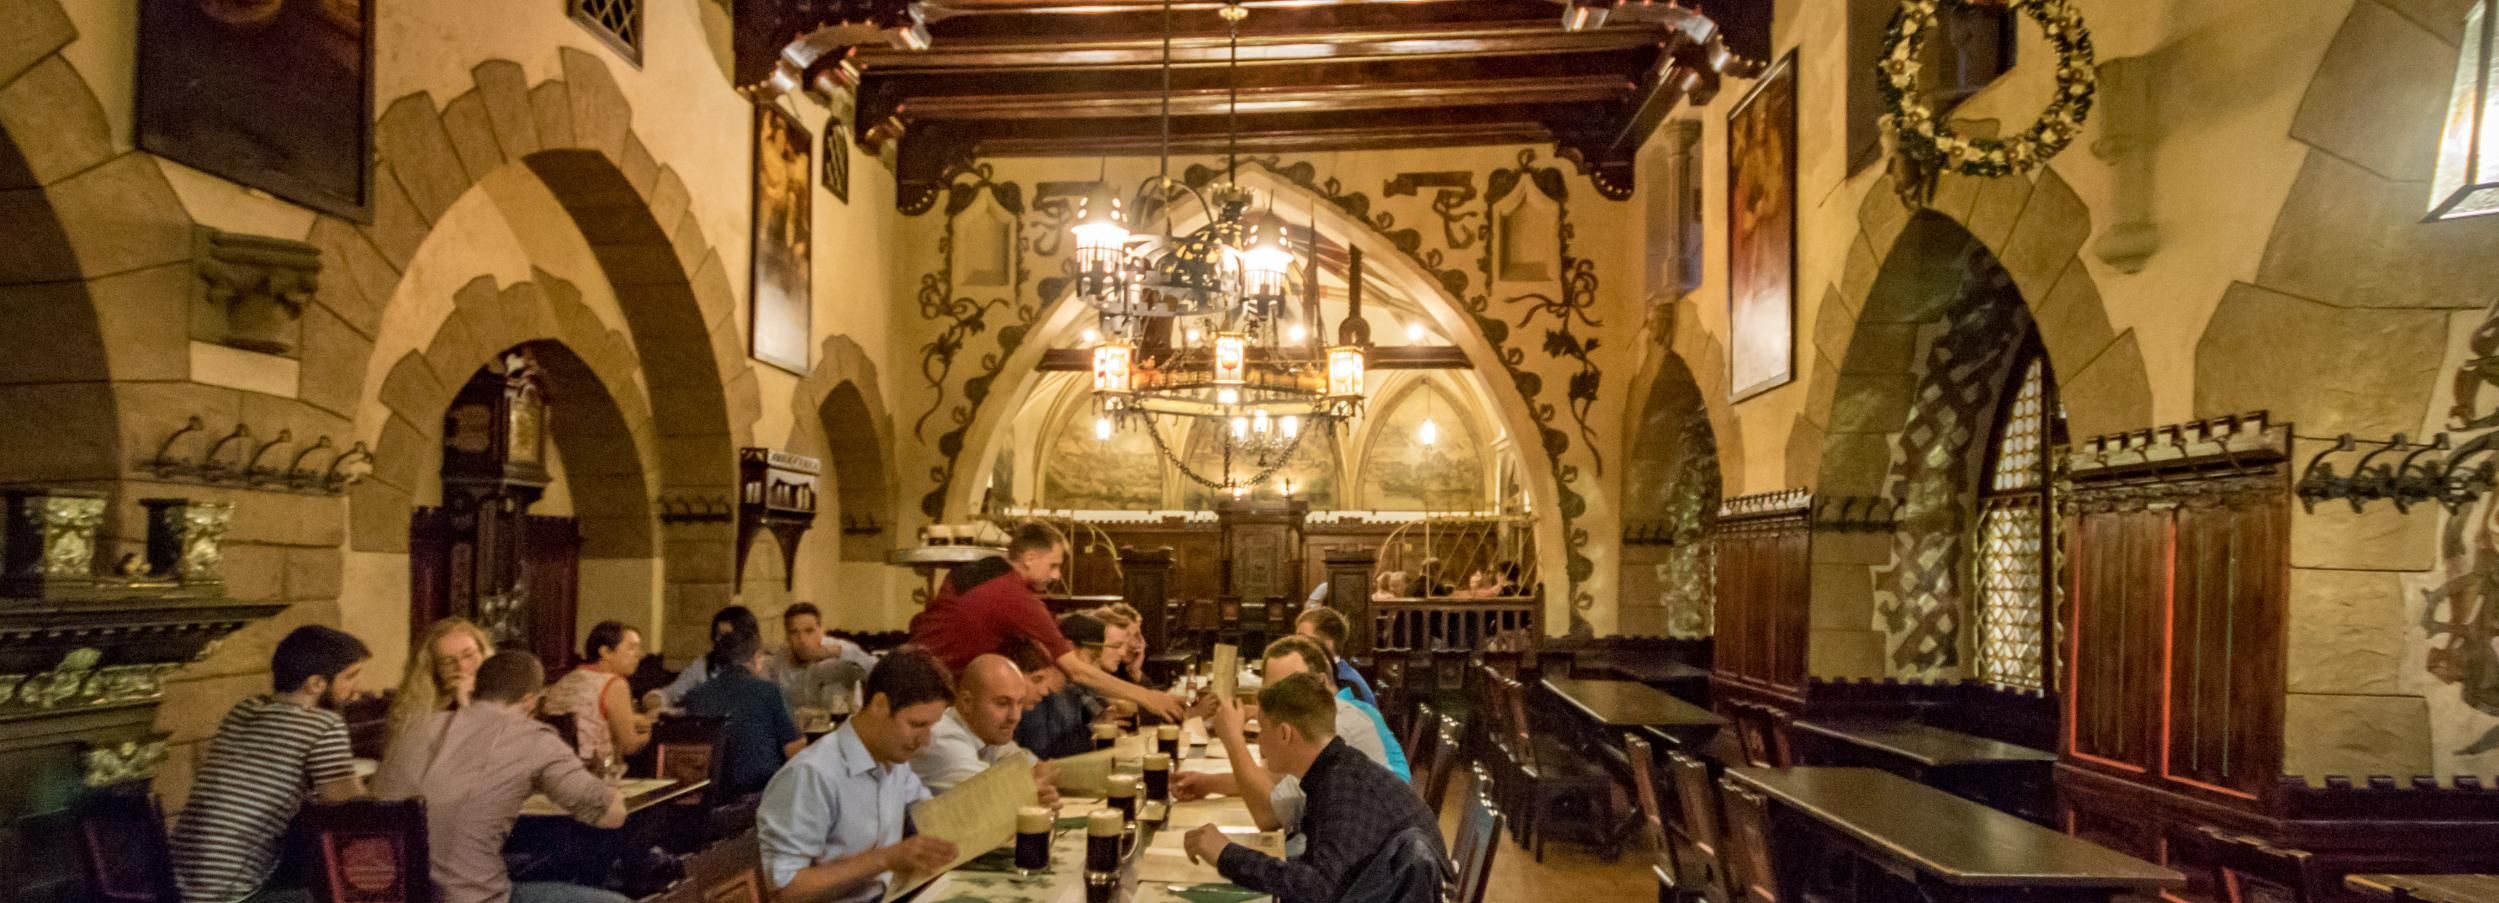 Praga: Tour legendario de cerveza con cena